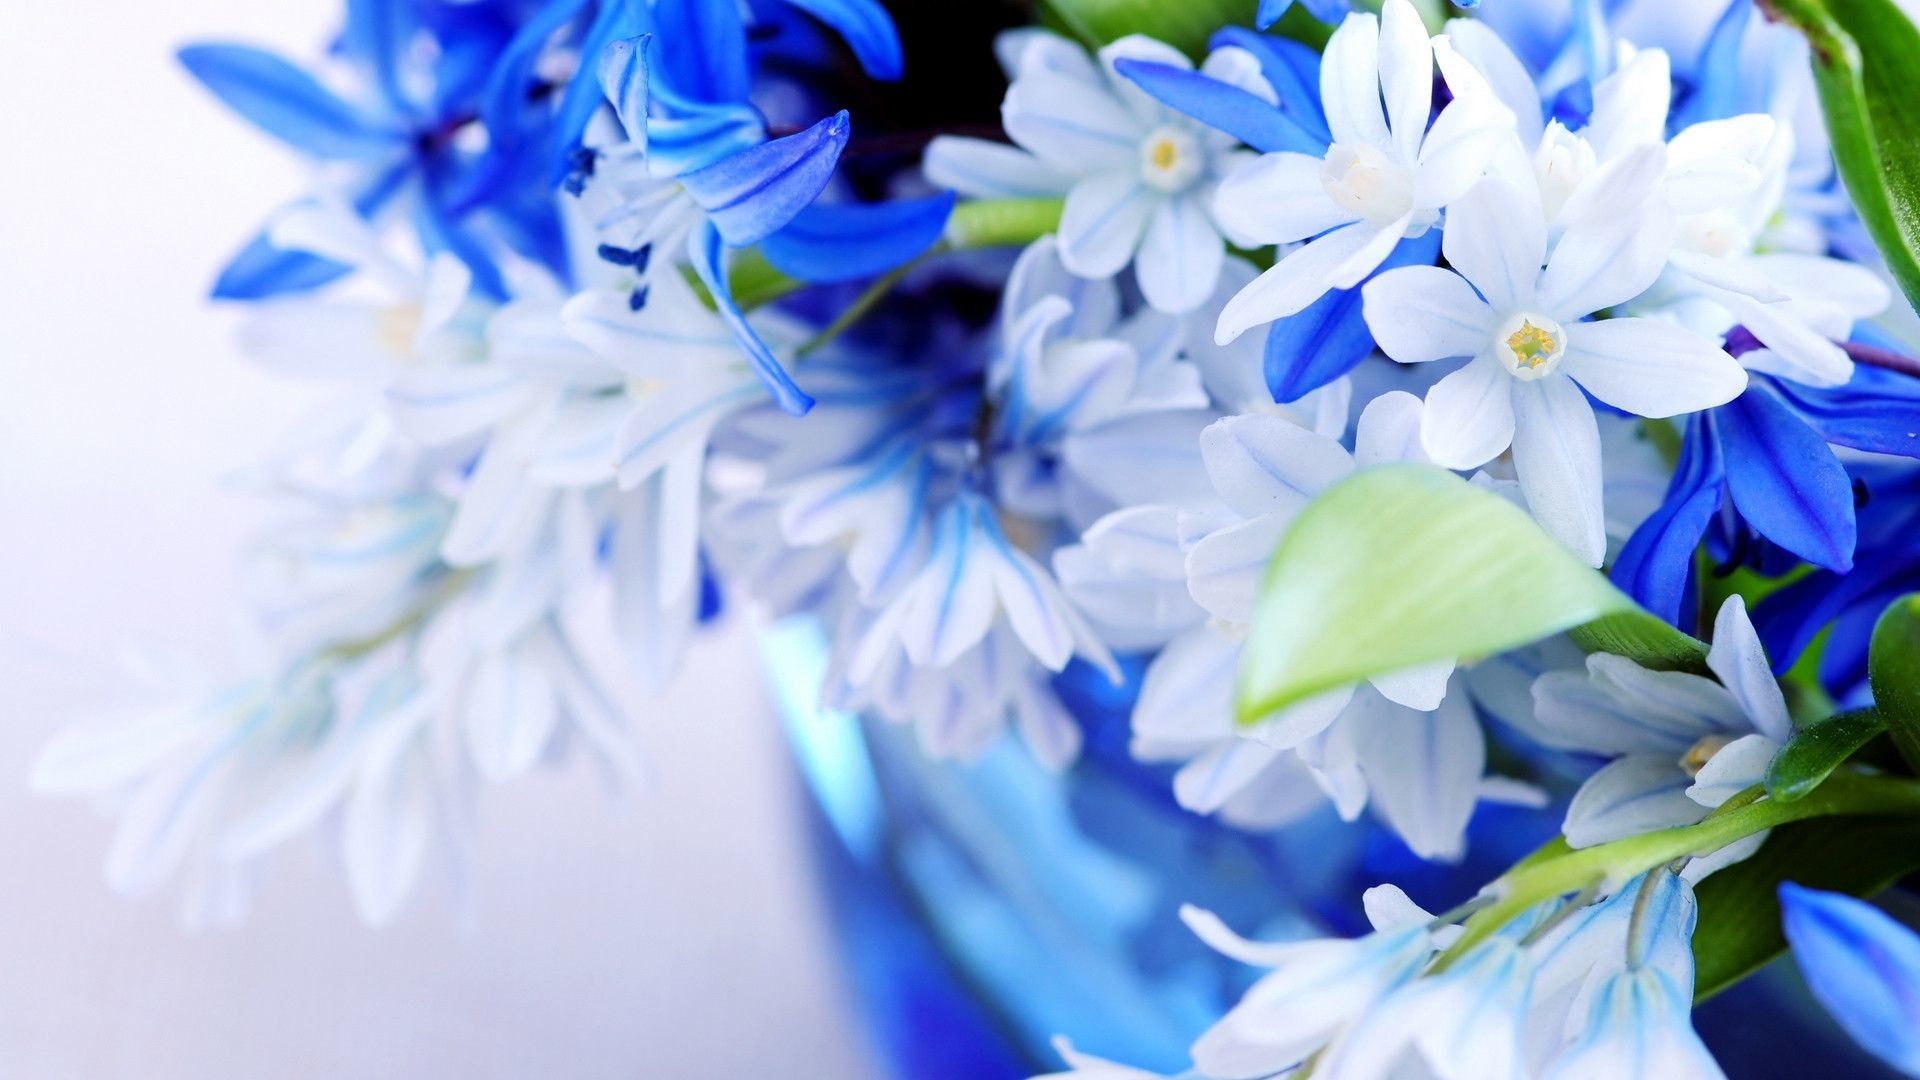 Desktop Wallpaper HD 3D Full Screen Flowers.